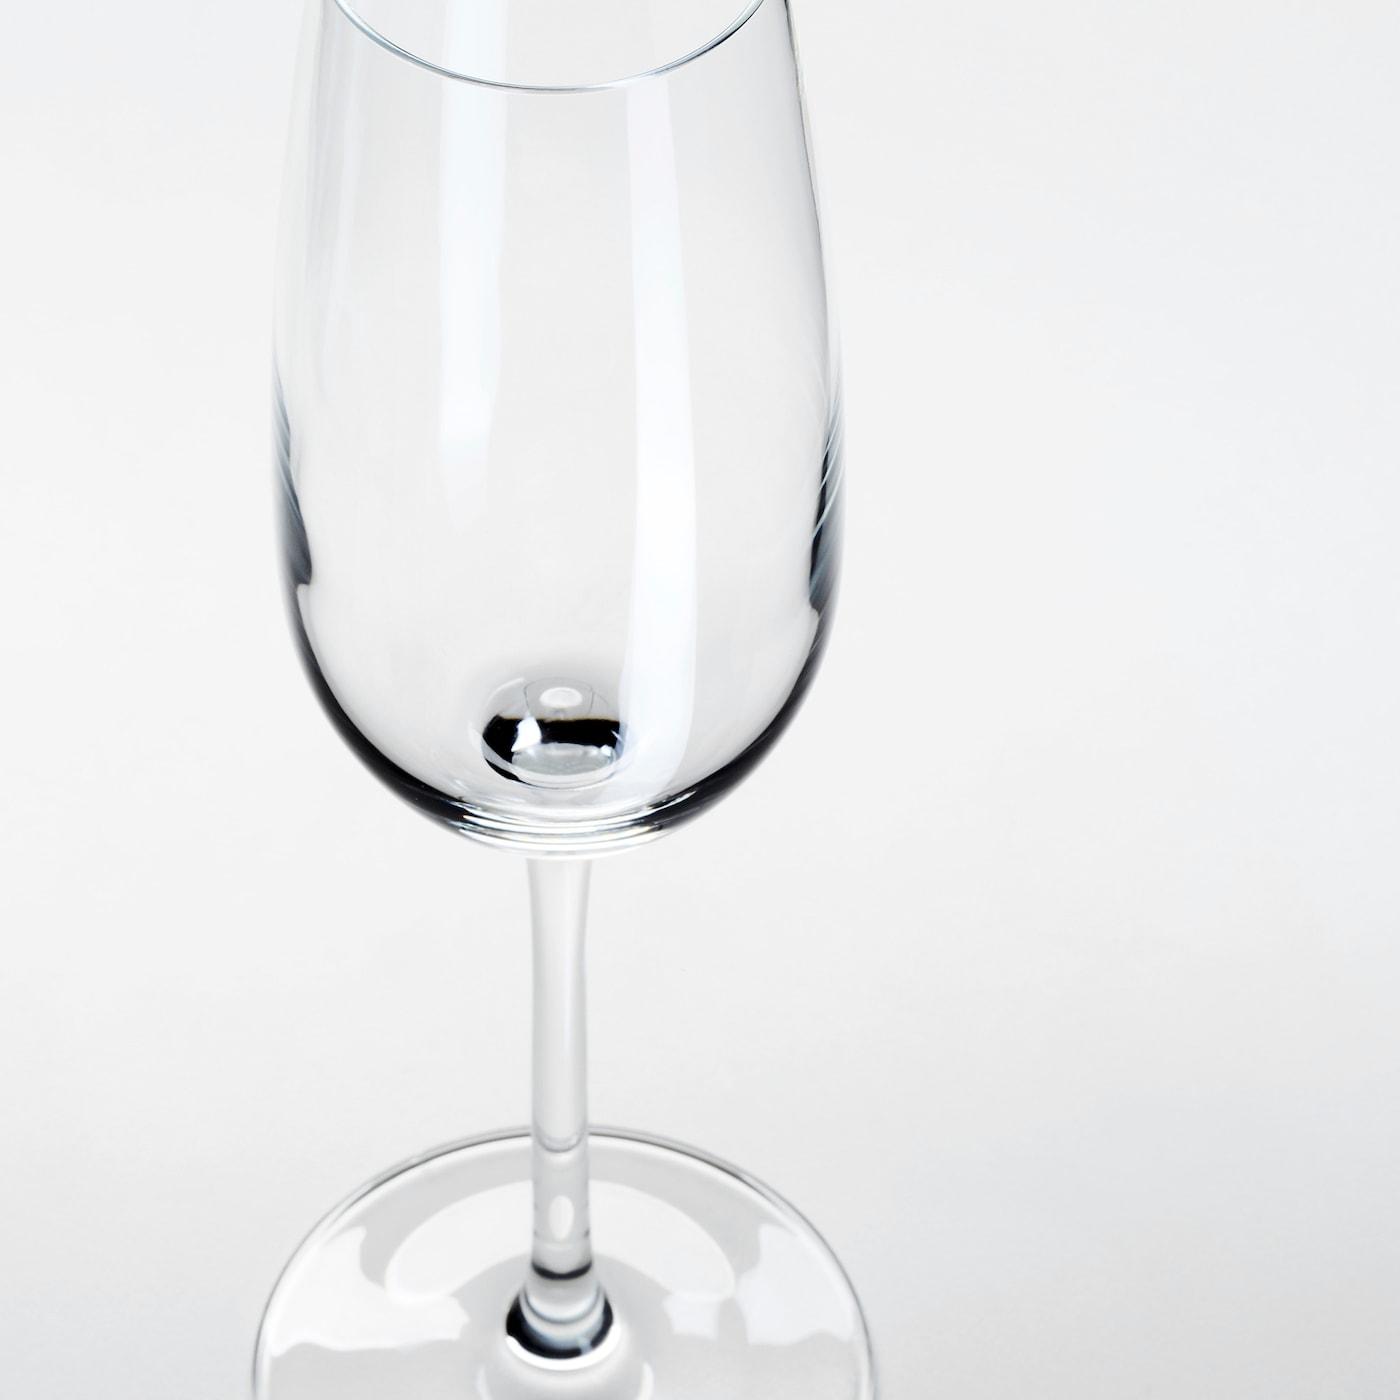 STORSINT Champagne glass, clear glass, 22 cl